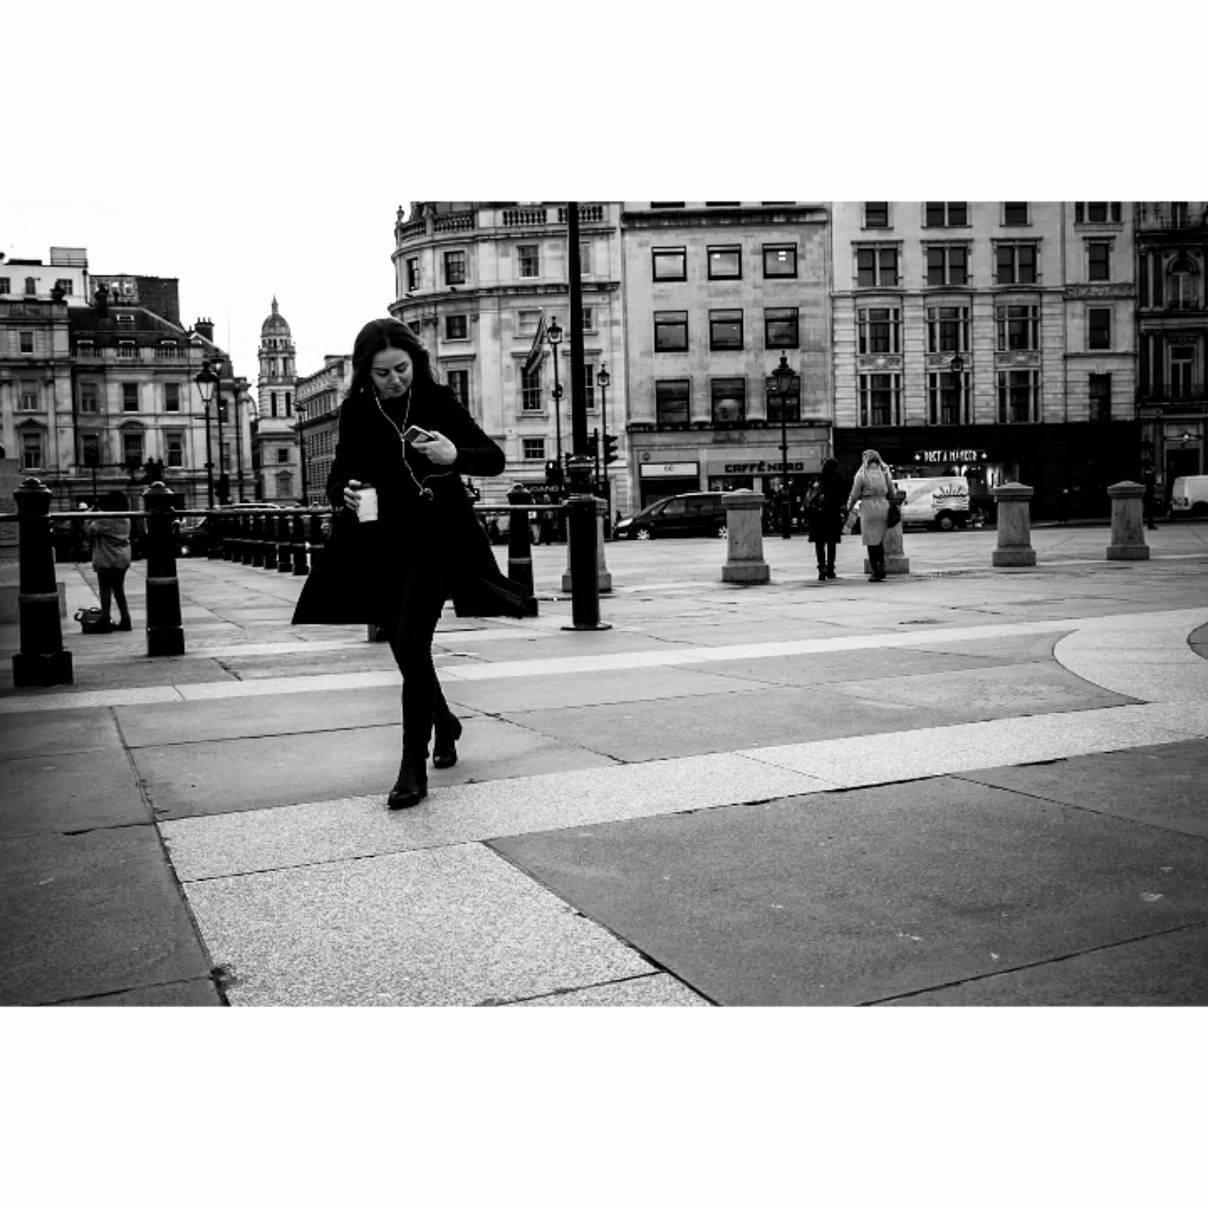 Silhouettes, London - January 2017